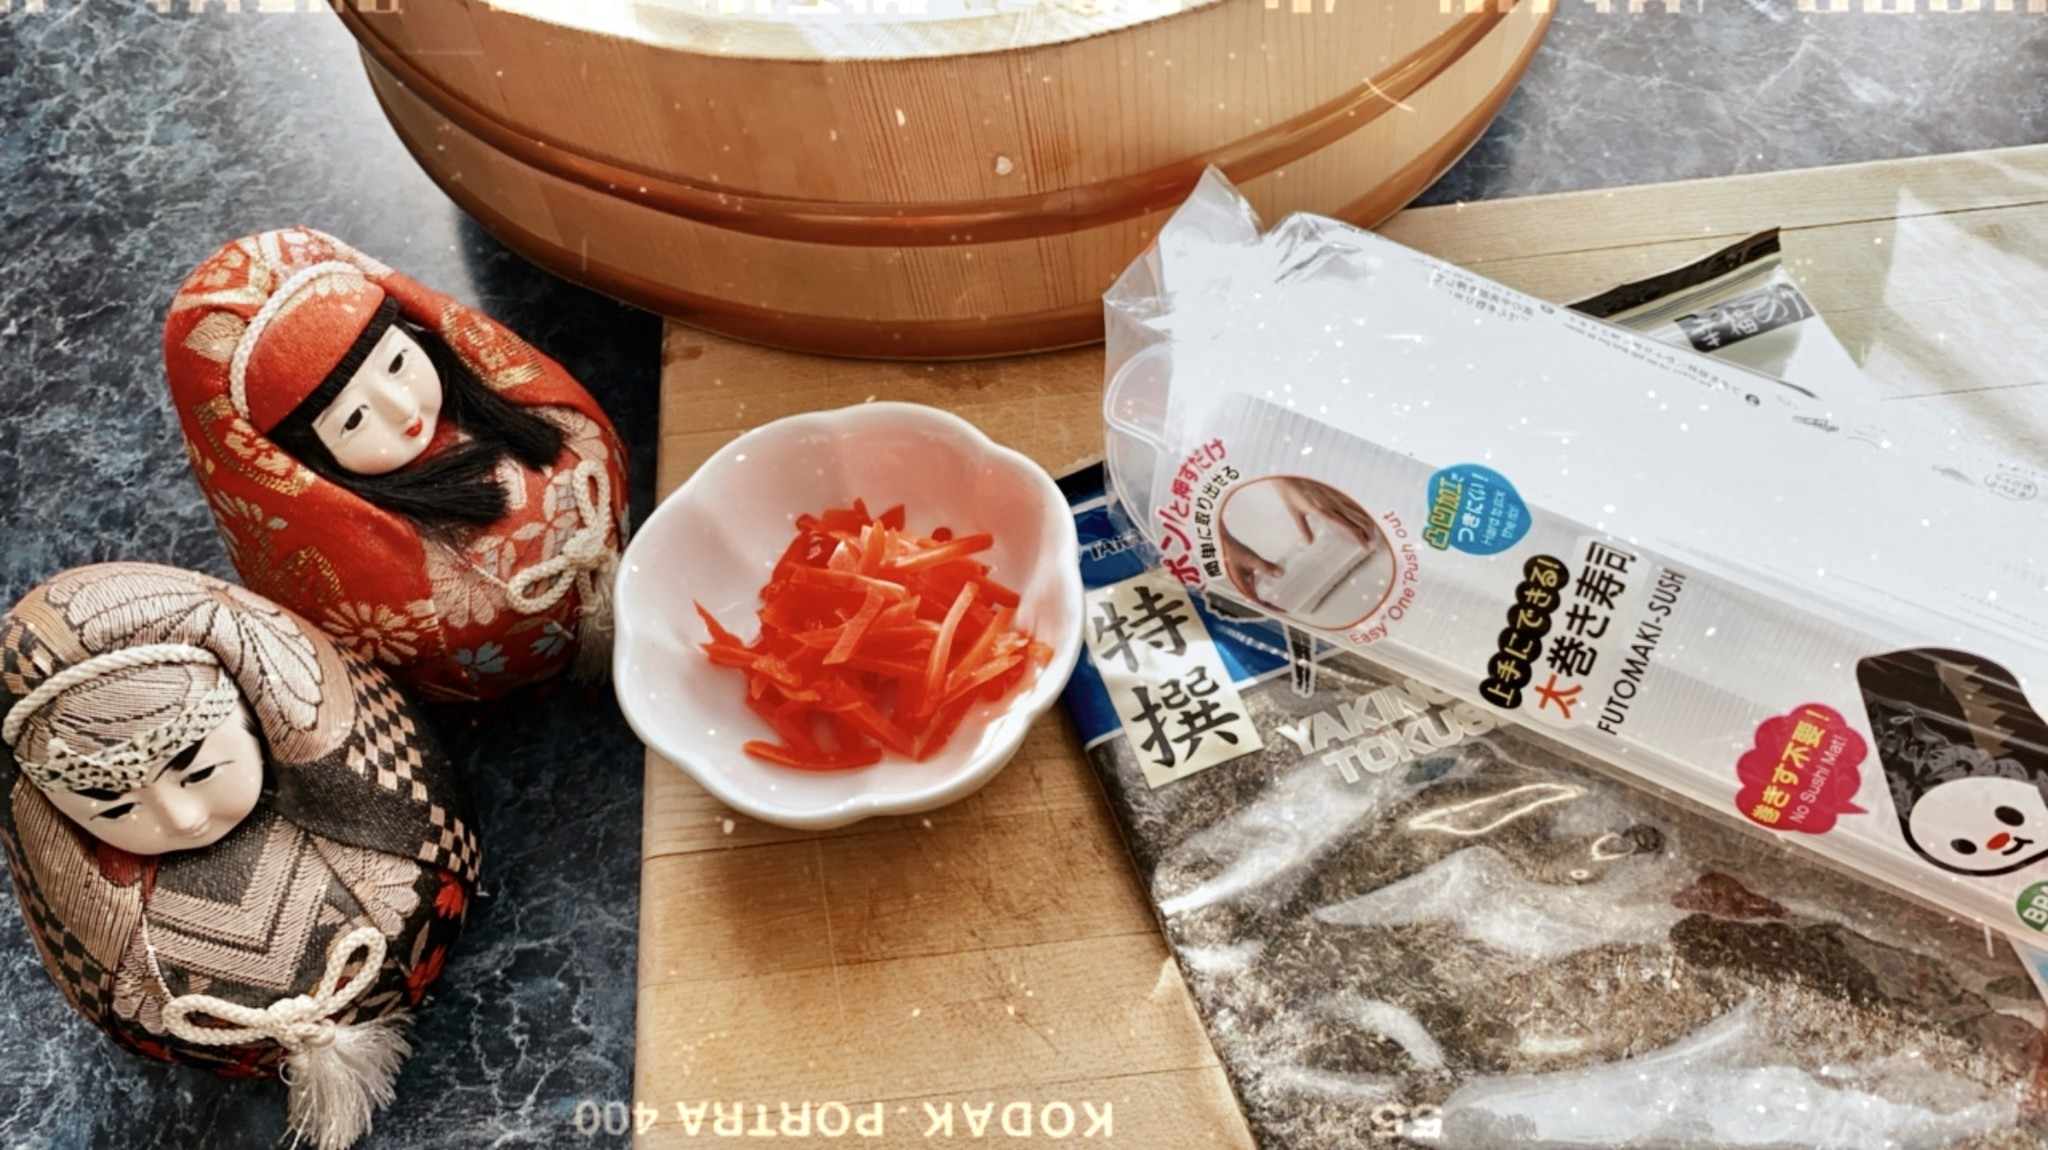 HOW-TO Use The Futomaki Sushi Mold